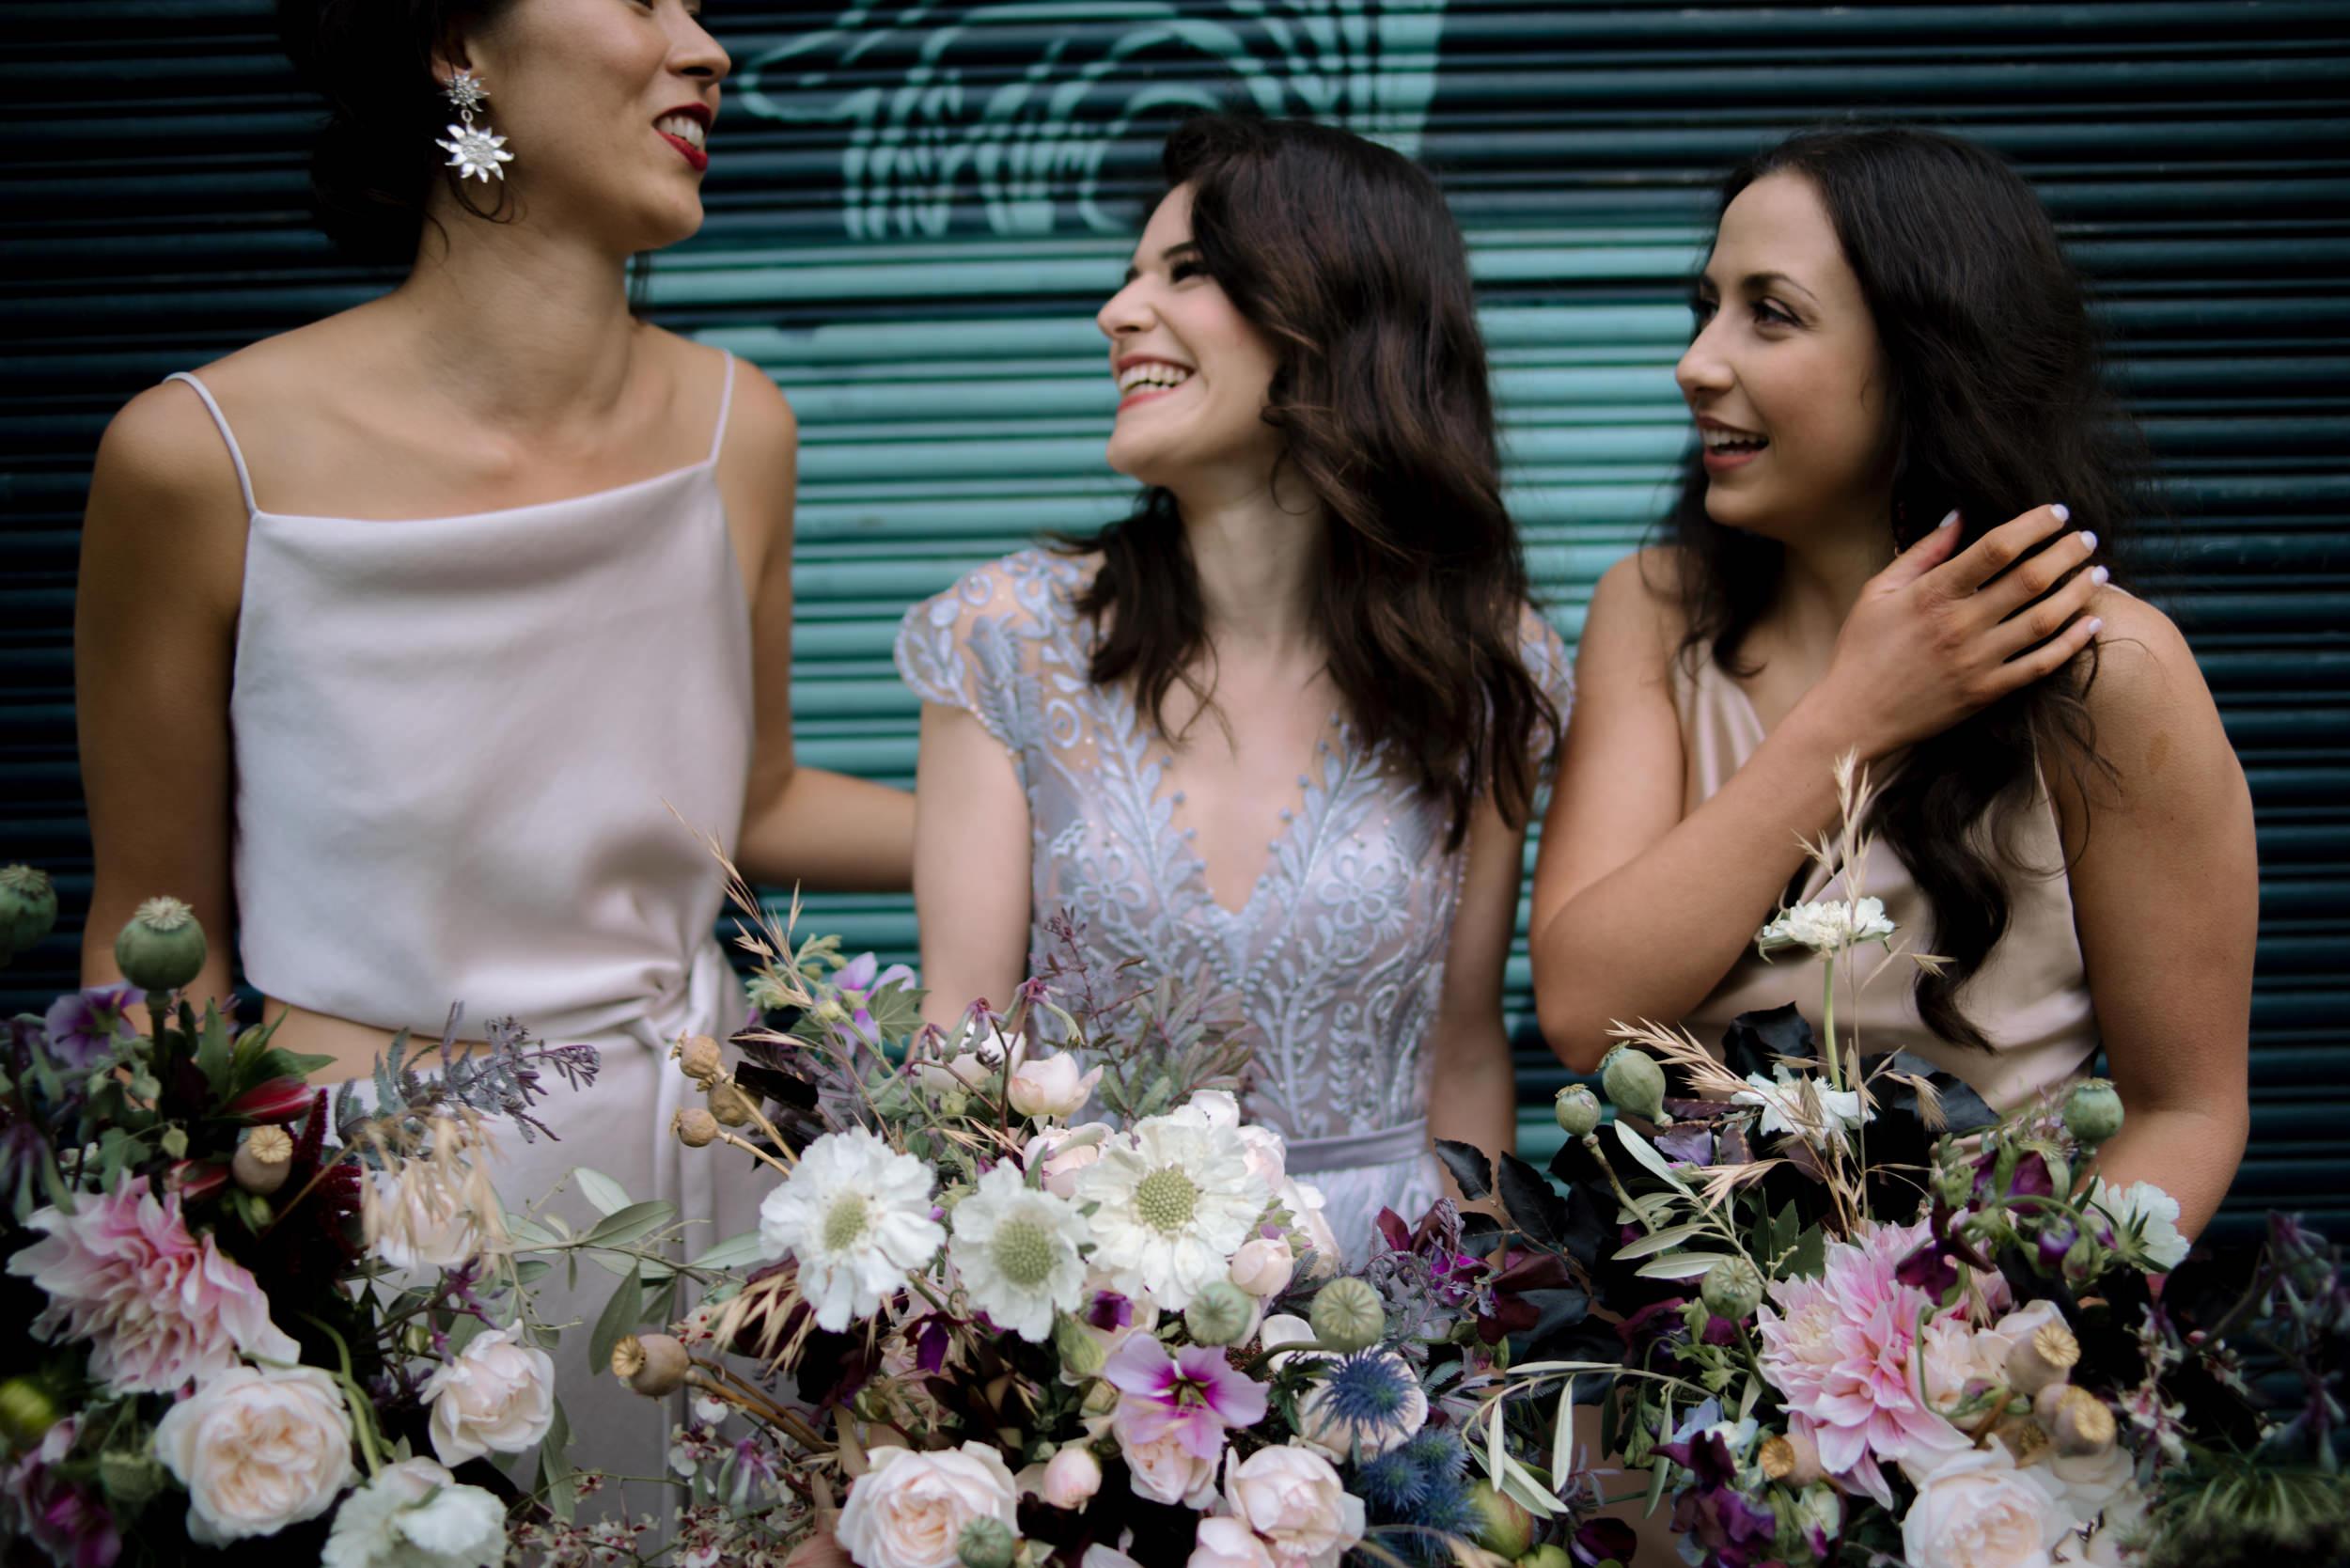 I-Got-You-Babe-&.Co.-Glasshaus-Wedding-Charlotte-Cameron0091.JPG